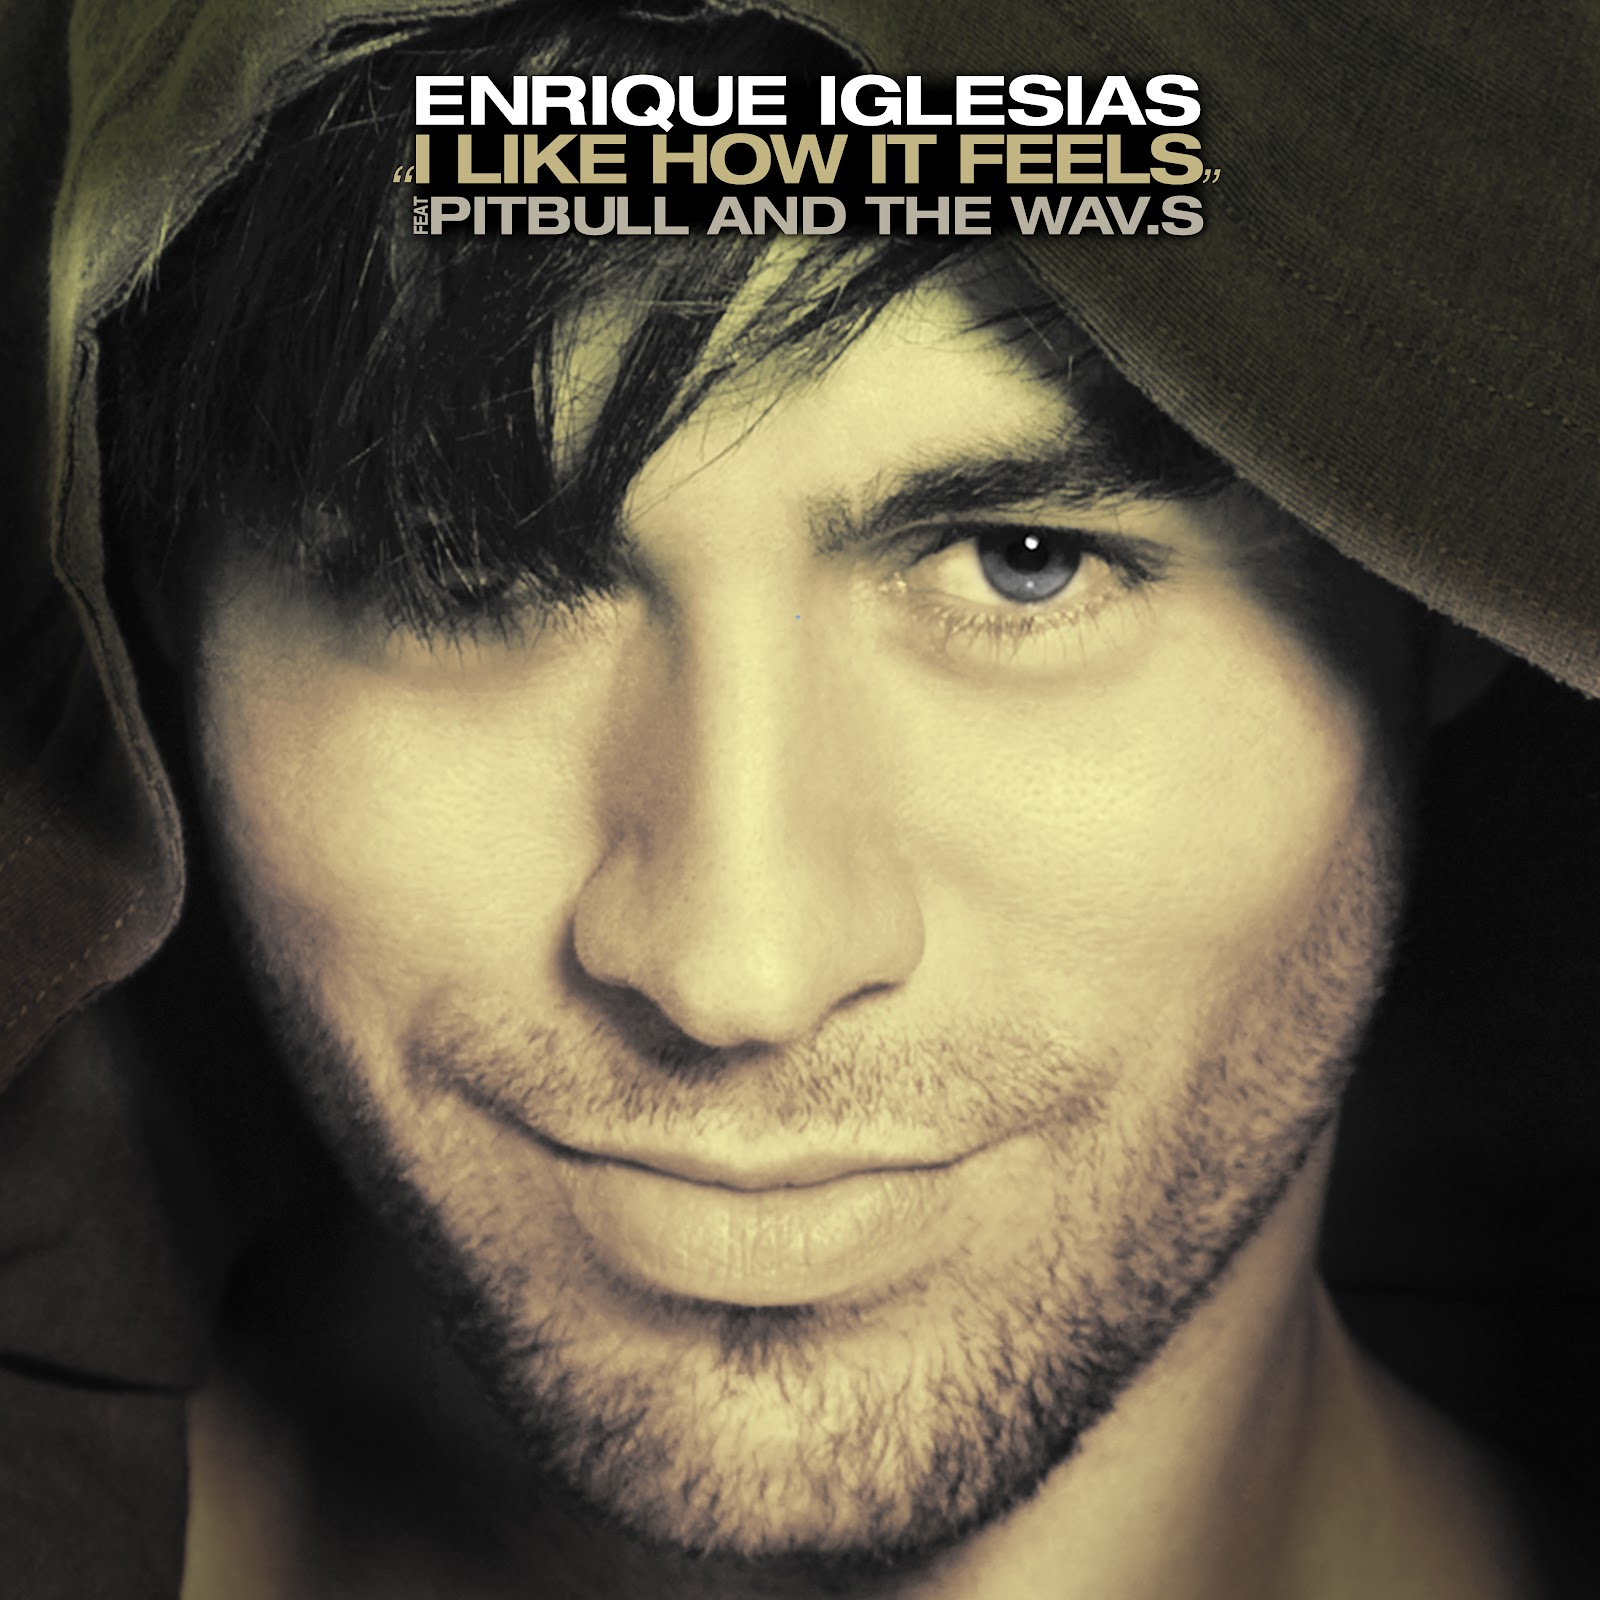 I Like It Enrique Iglesias